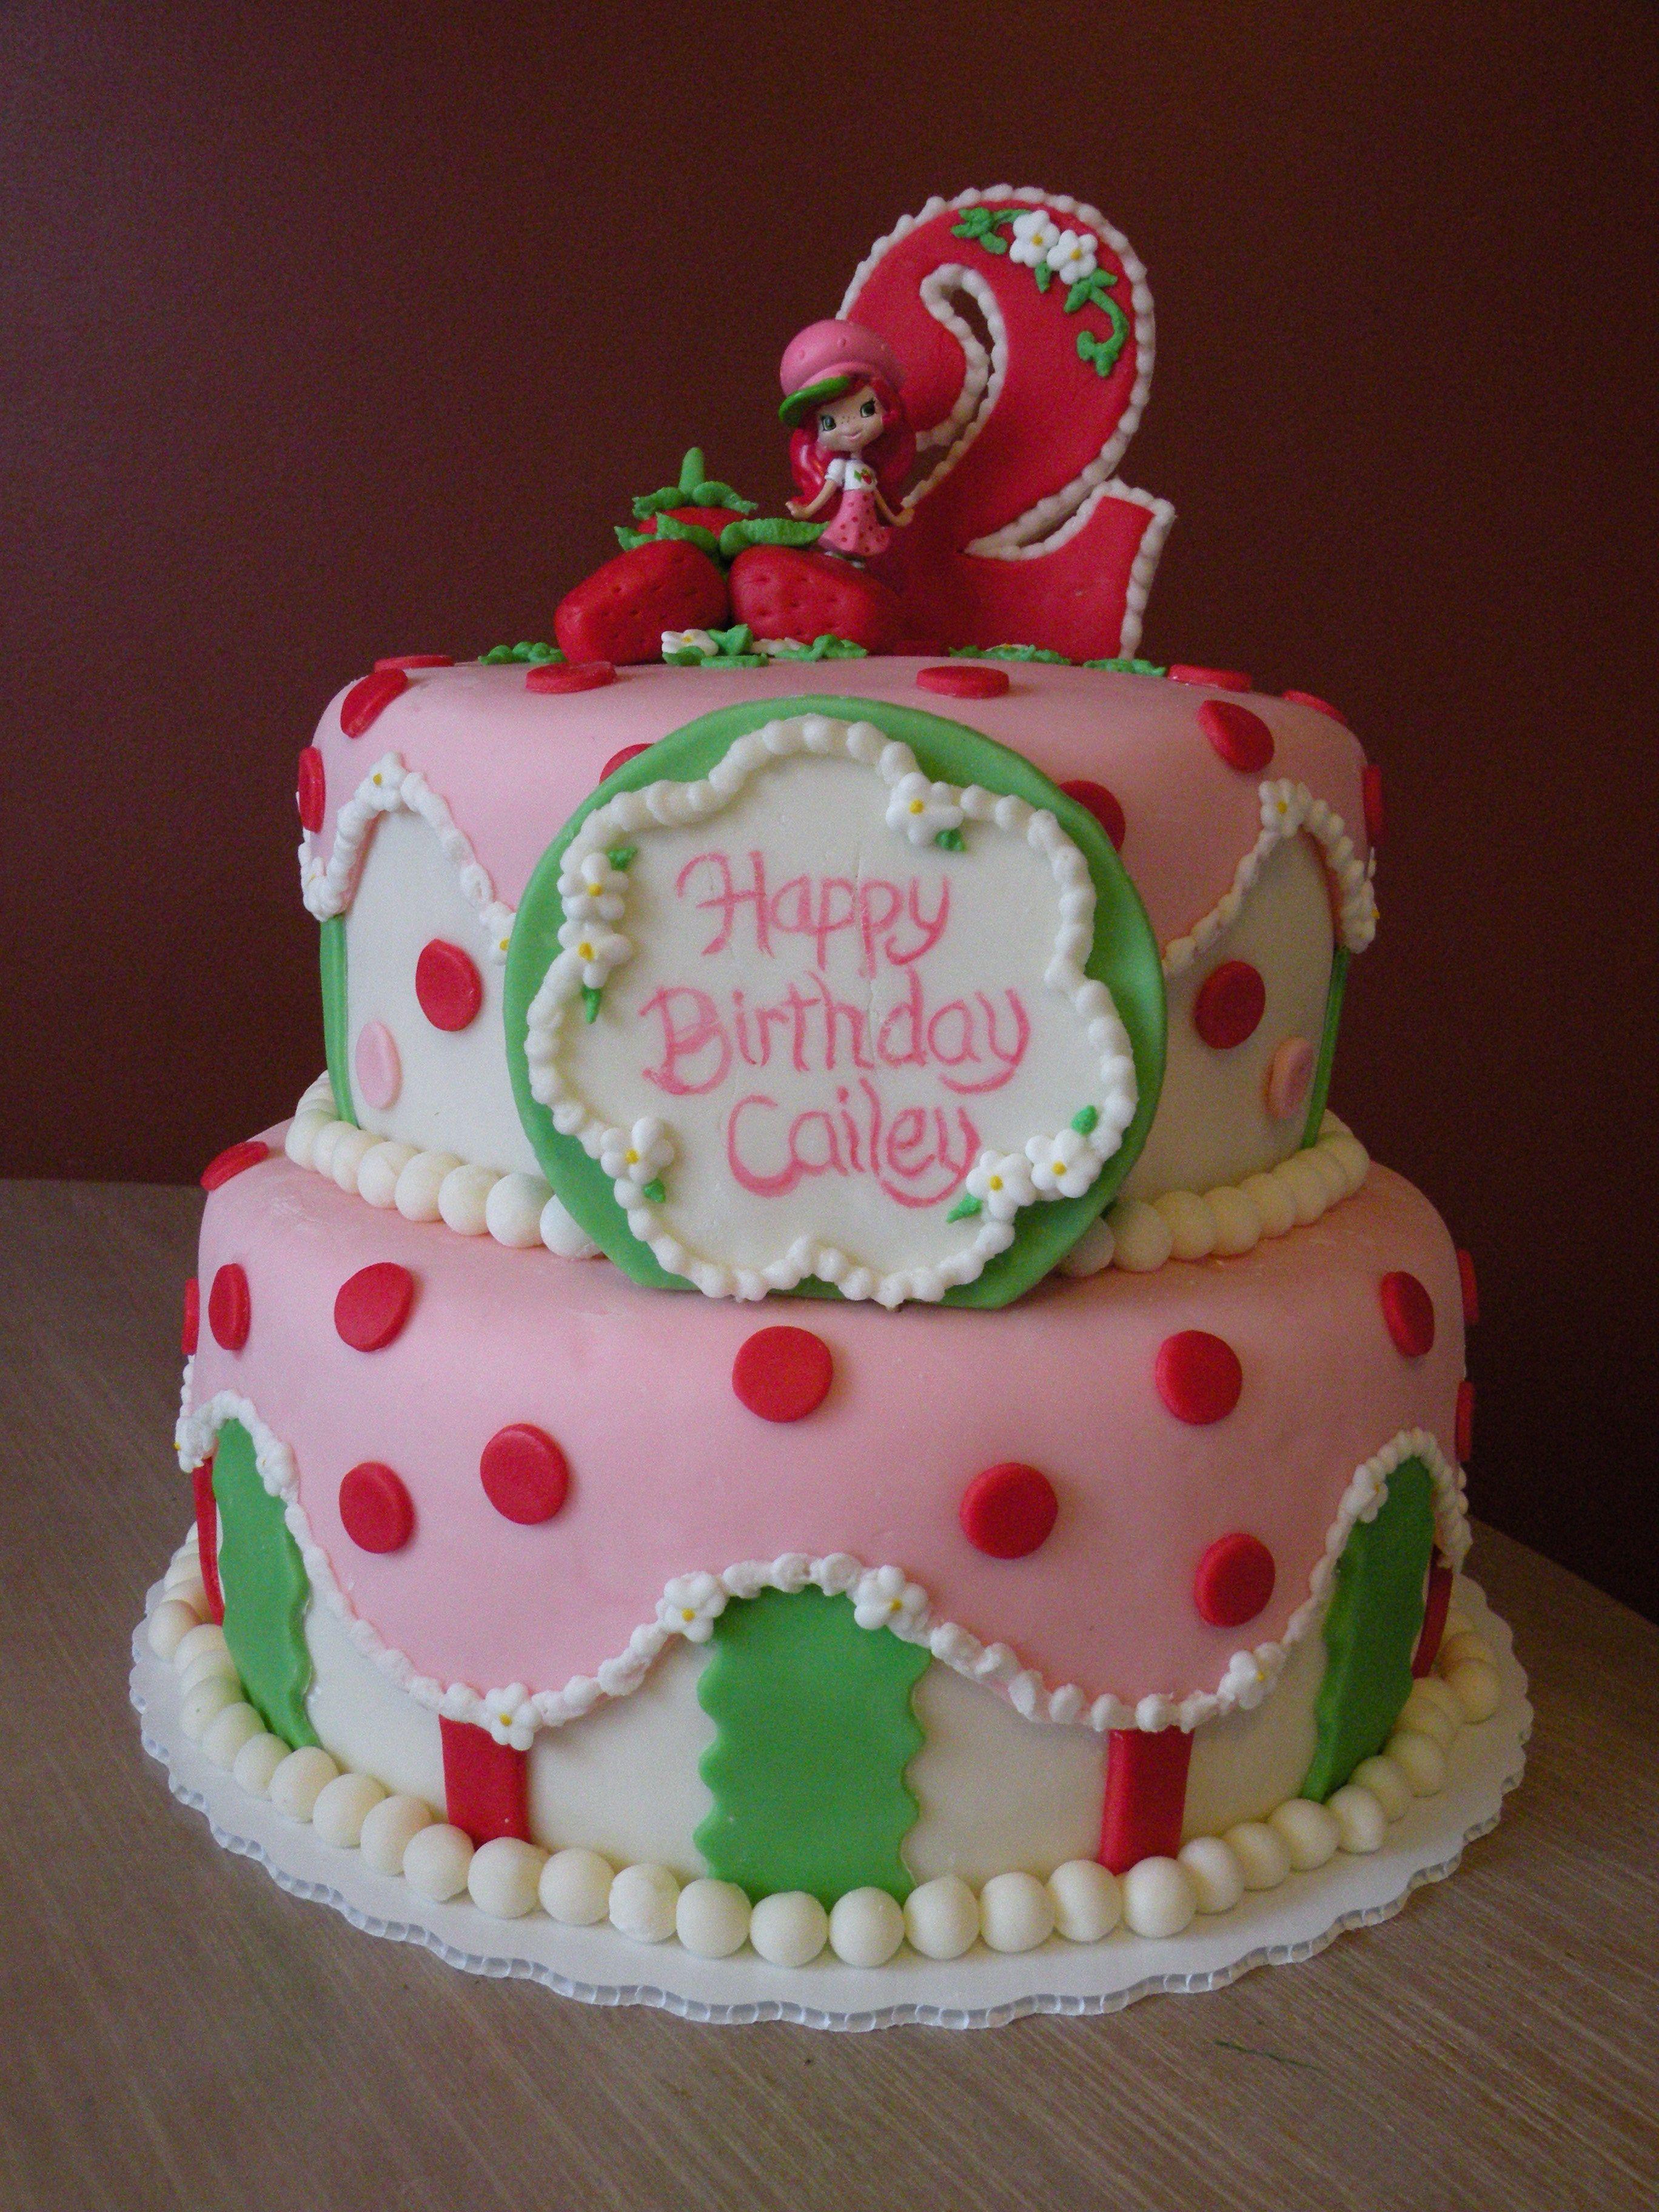 Strawberry Shortcake Birthday Cake Cake Made For A Little Girls - 2nd birthday cake designs